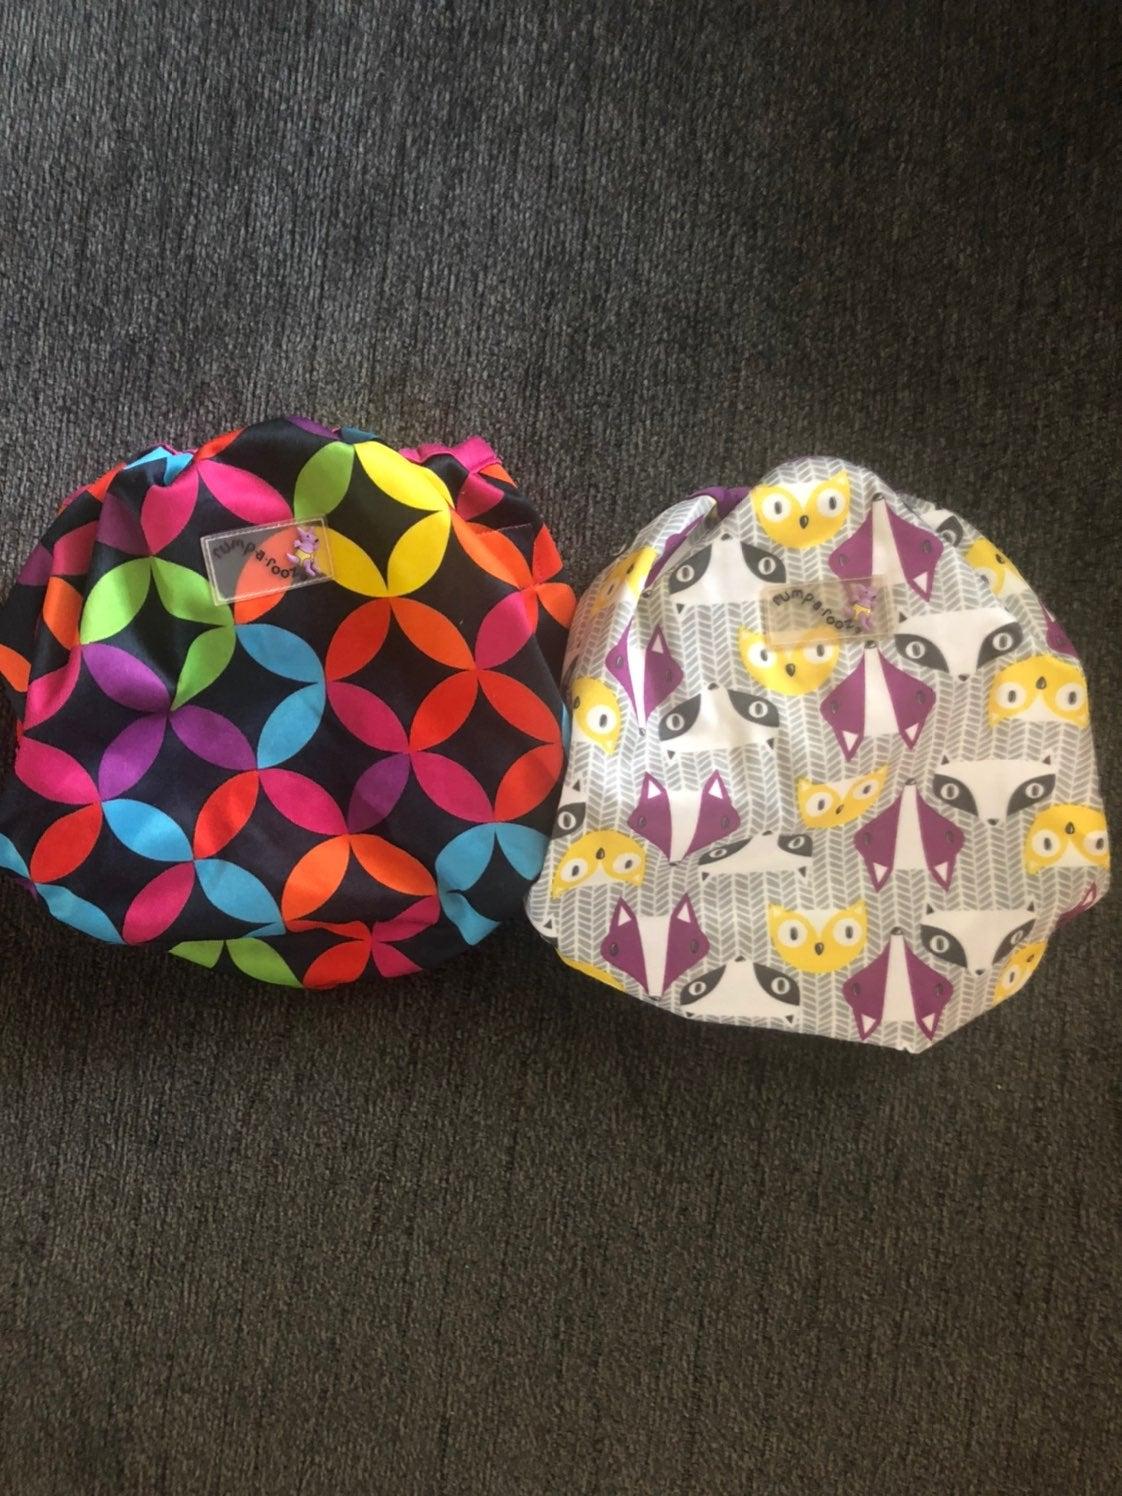 Rumparooz Cloth Diaper Cover- set of 2